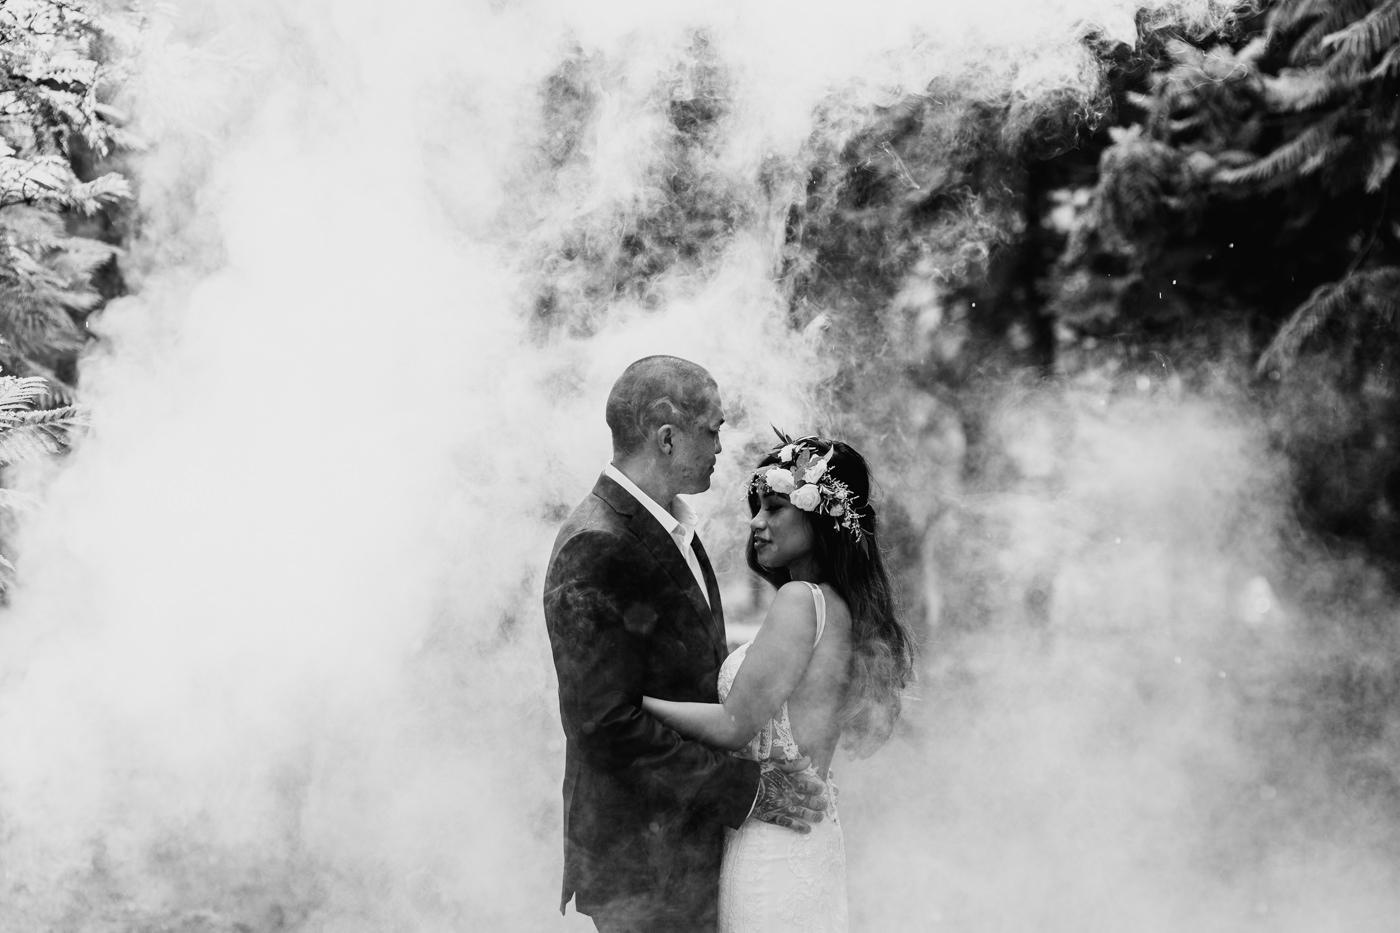 Nick & Vanezza - Fernbank Farm Wedding - Samantha Heather Photography-123.jpg